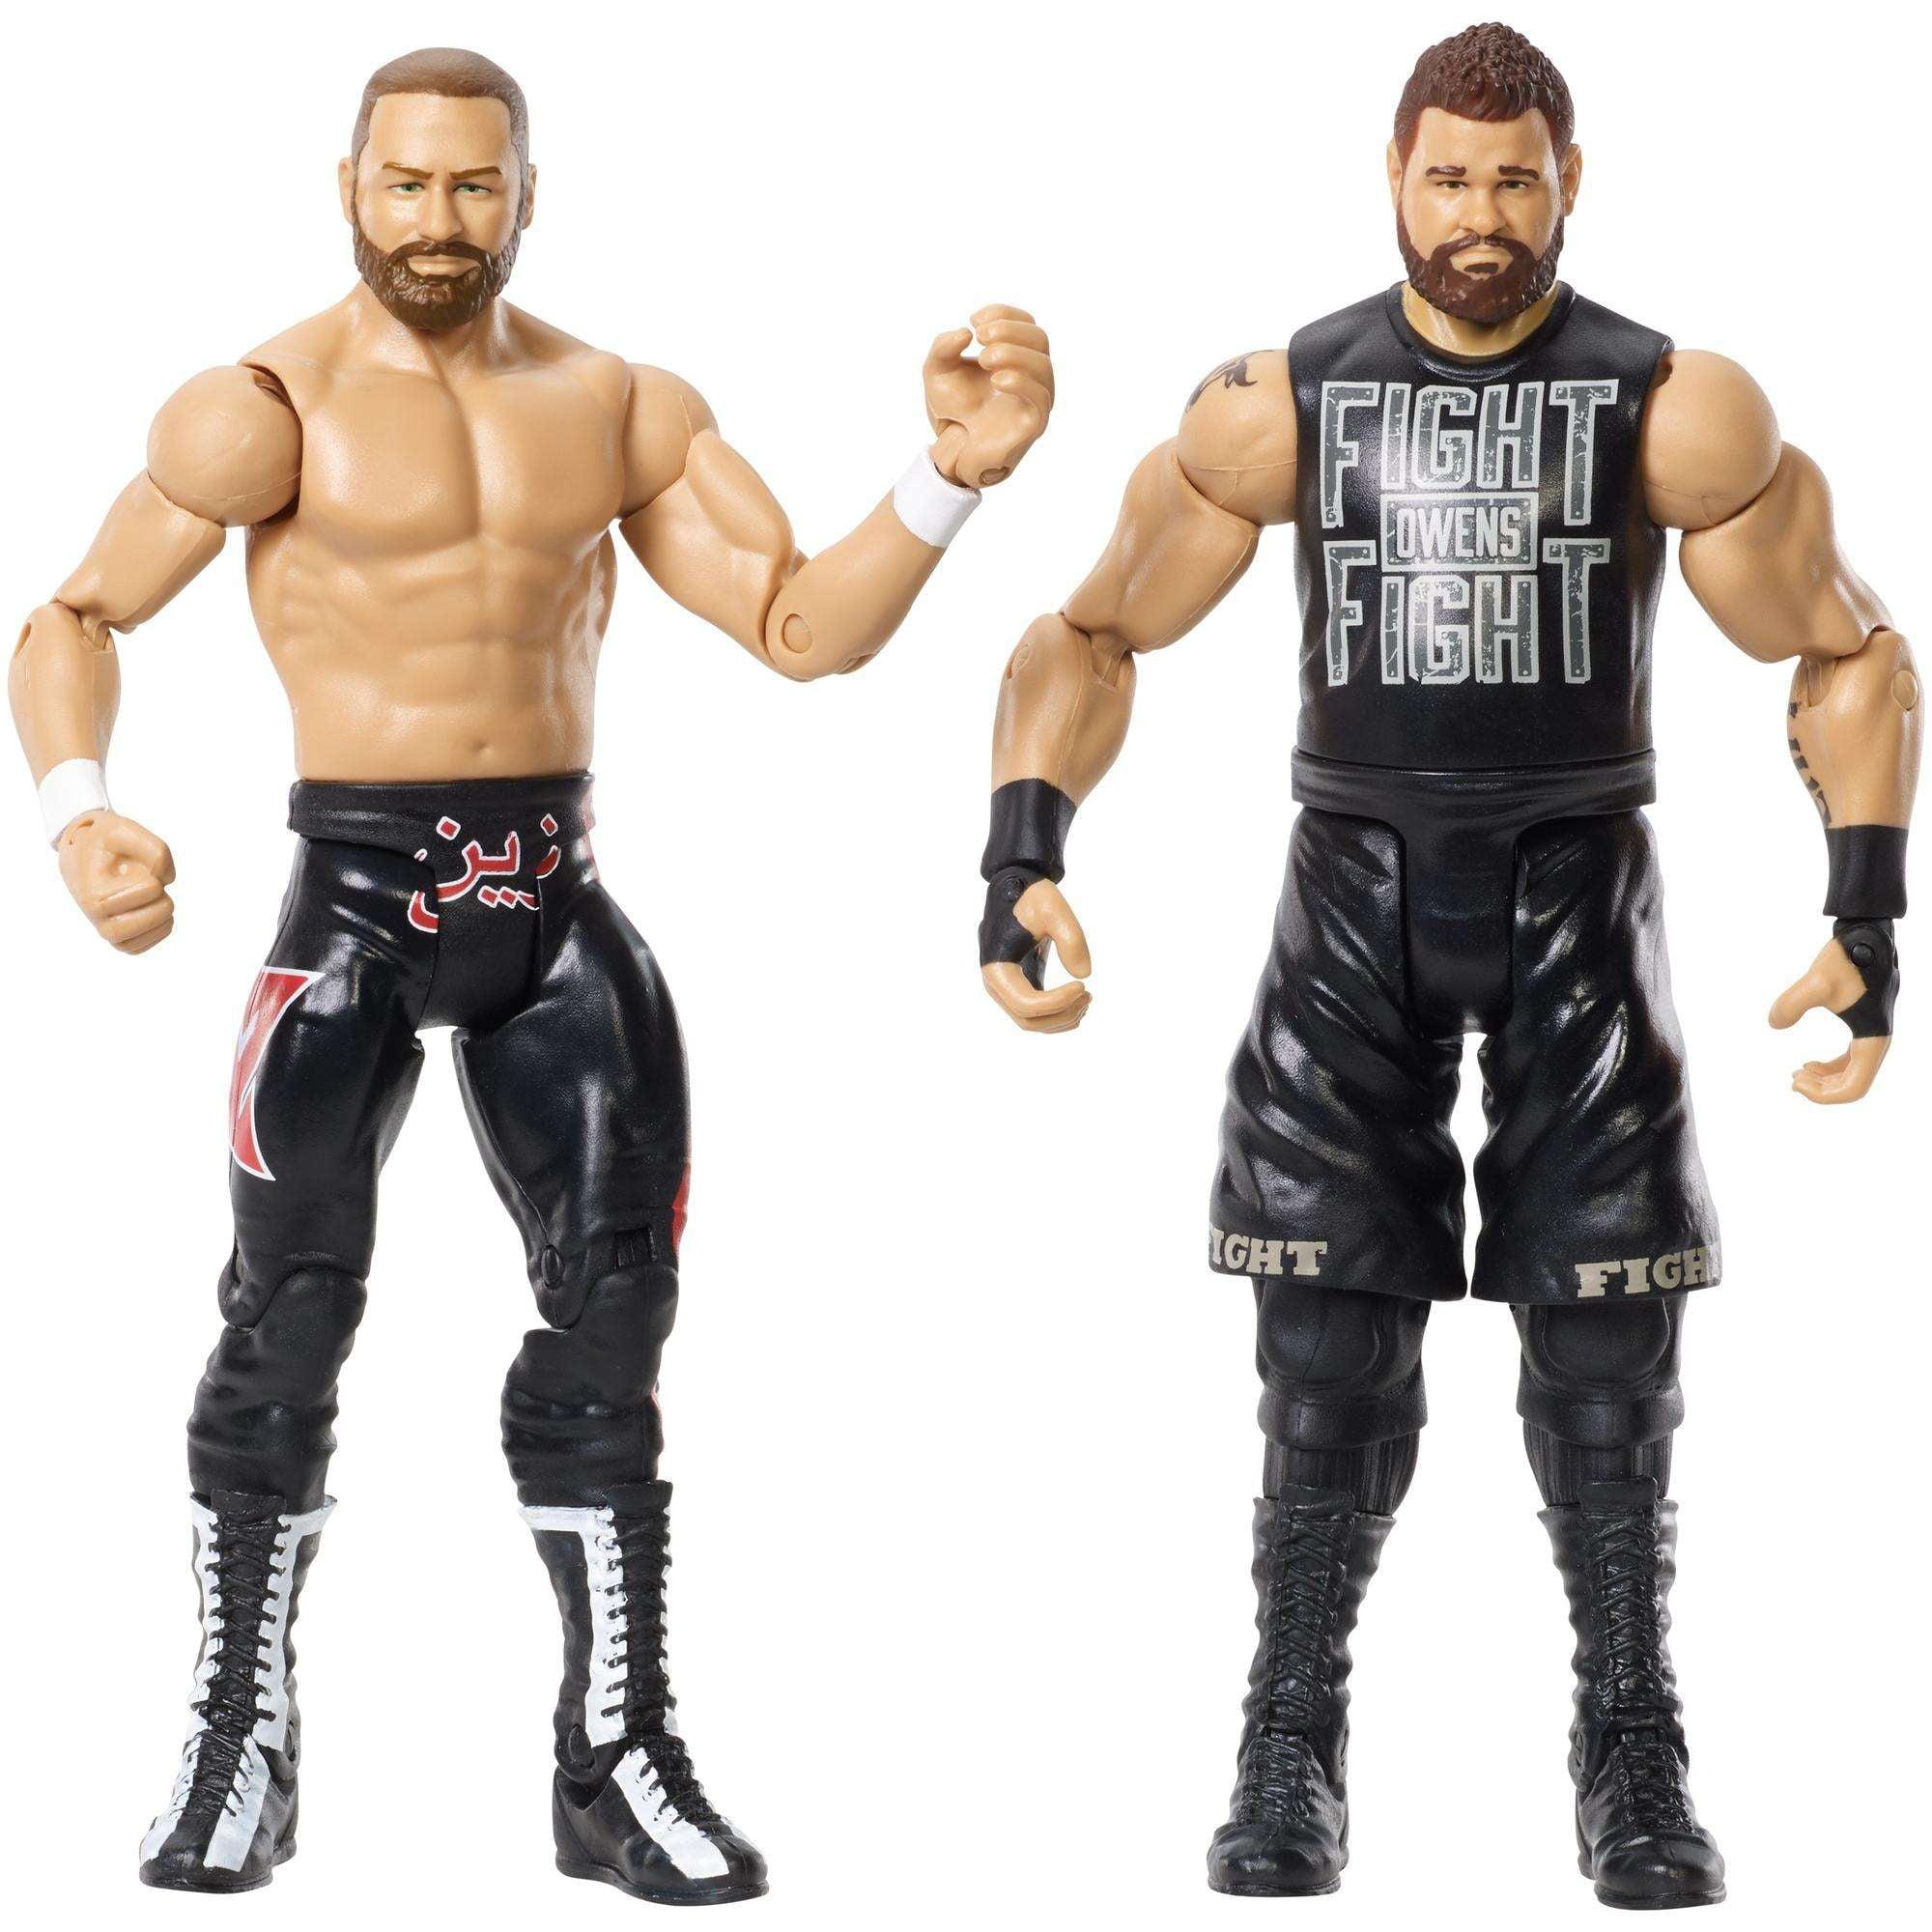 WWE Sami Zayne and Kevin Owens Action Figure, 2 Pack